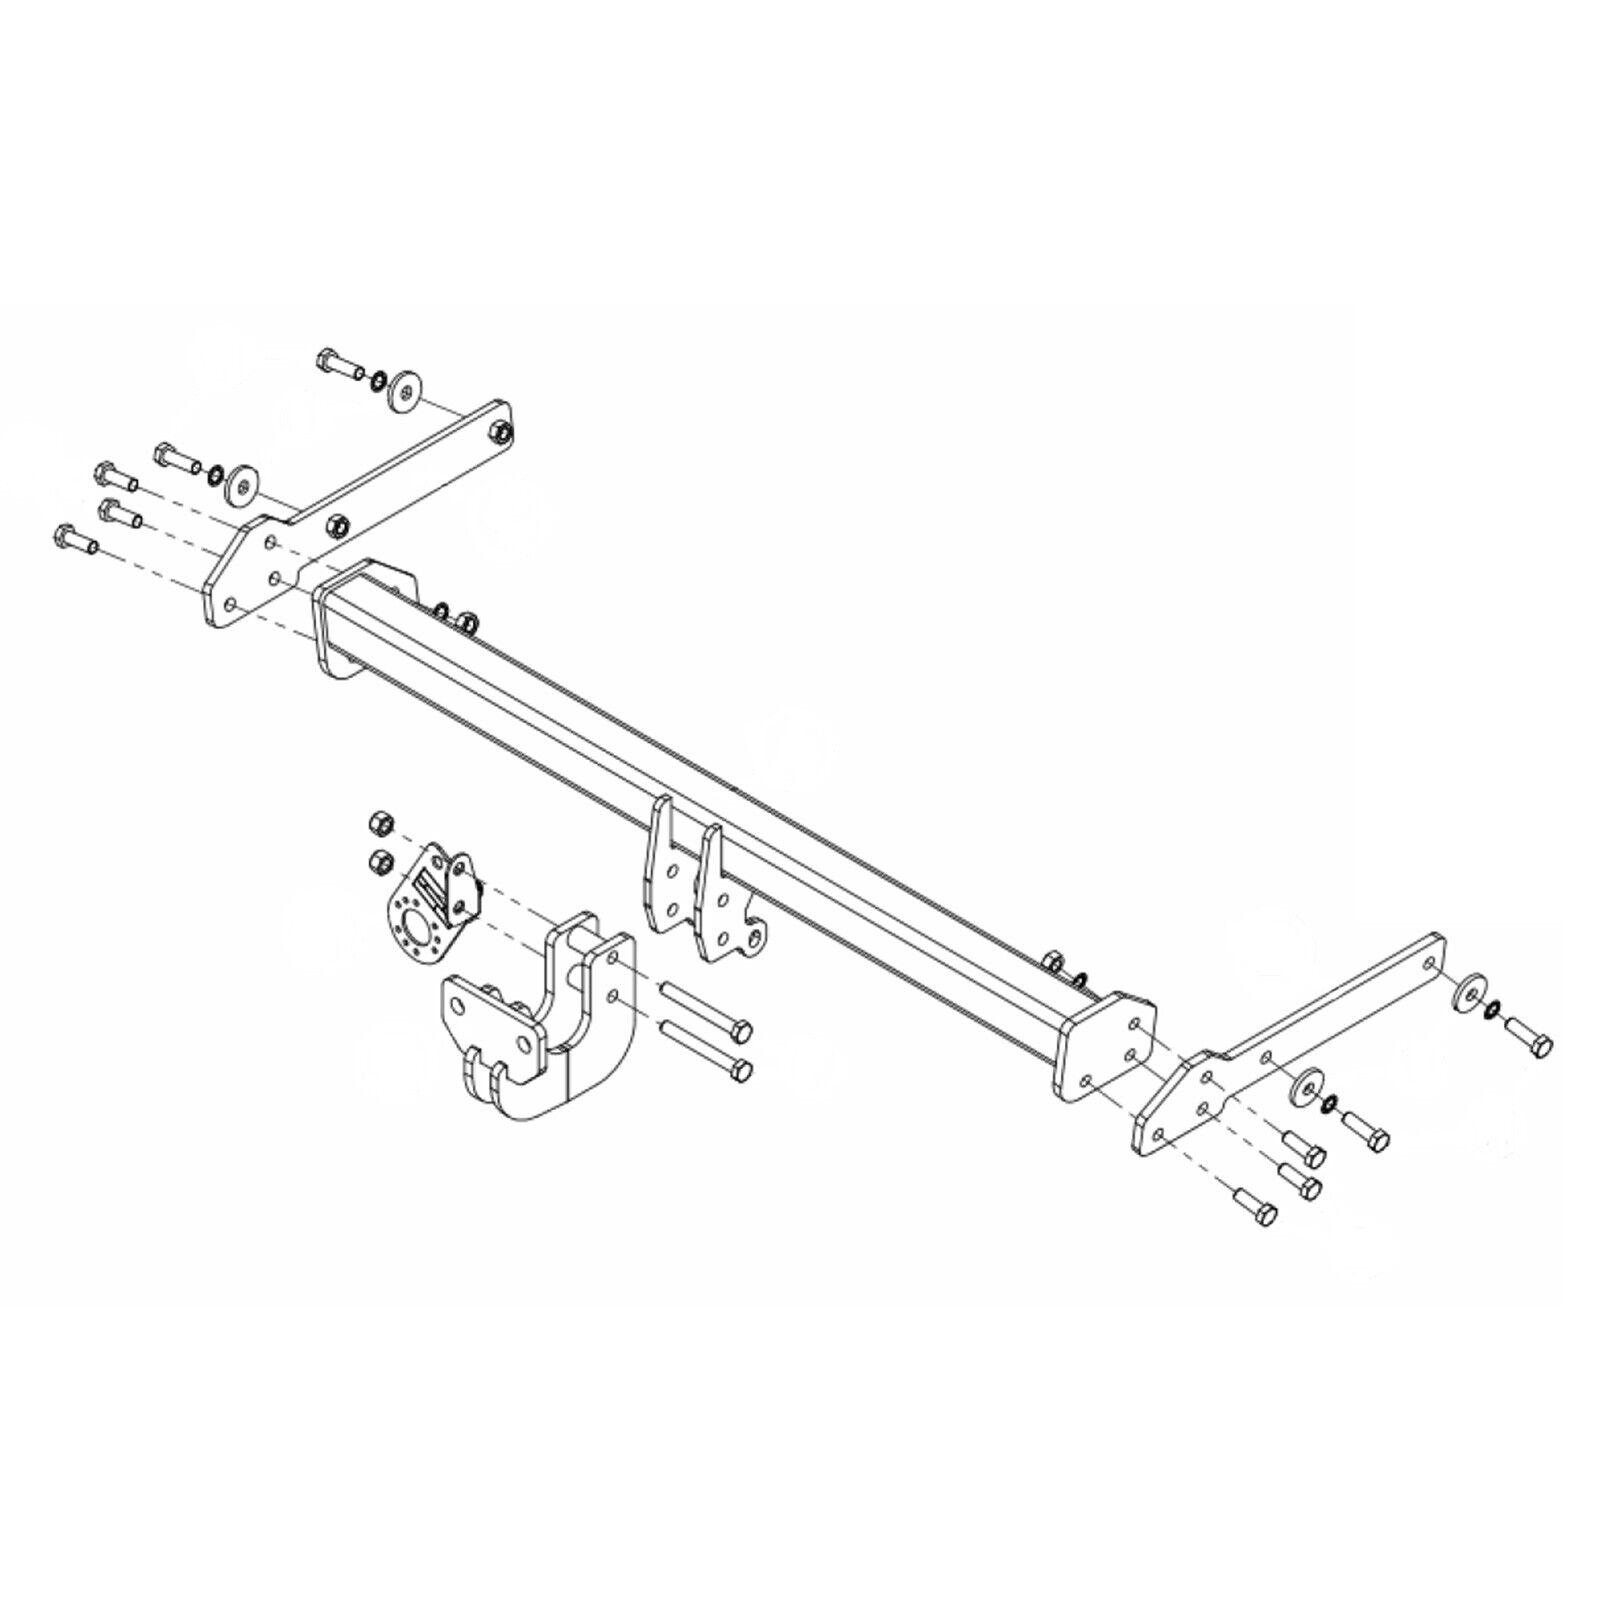 hight resolution of details about towbar for skoda octavia estate 2013 onwards flange tow bar